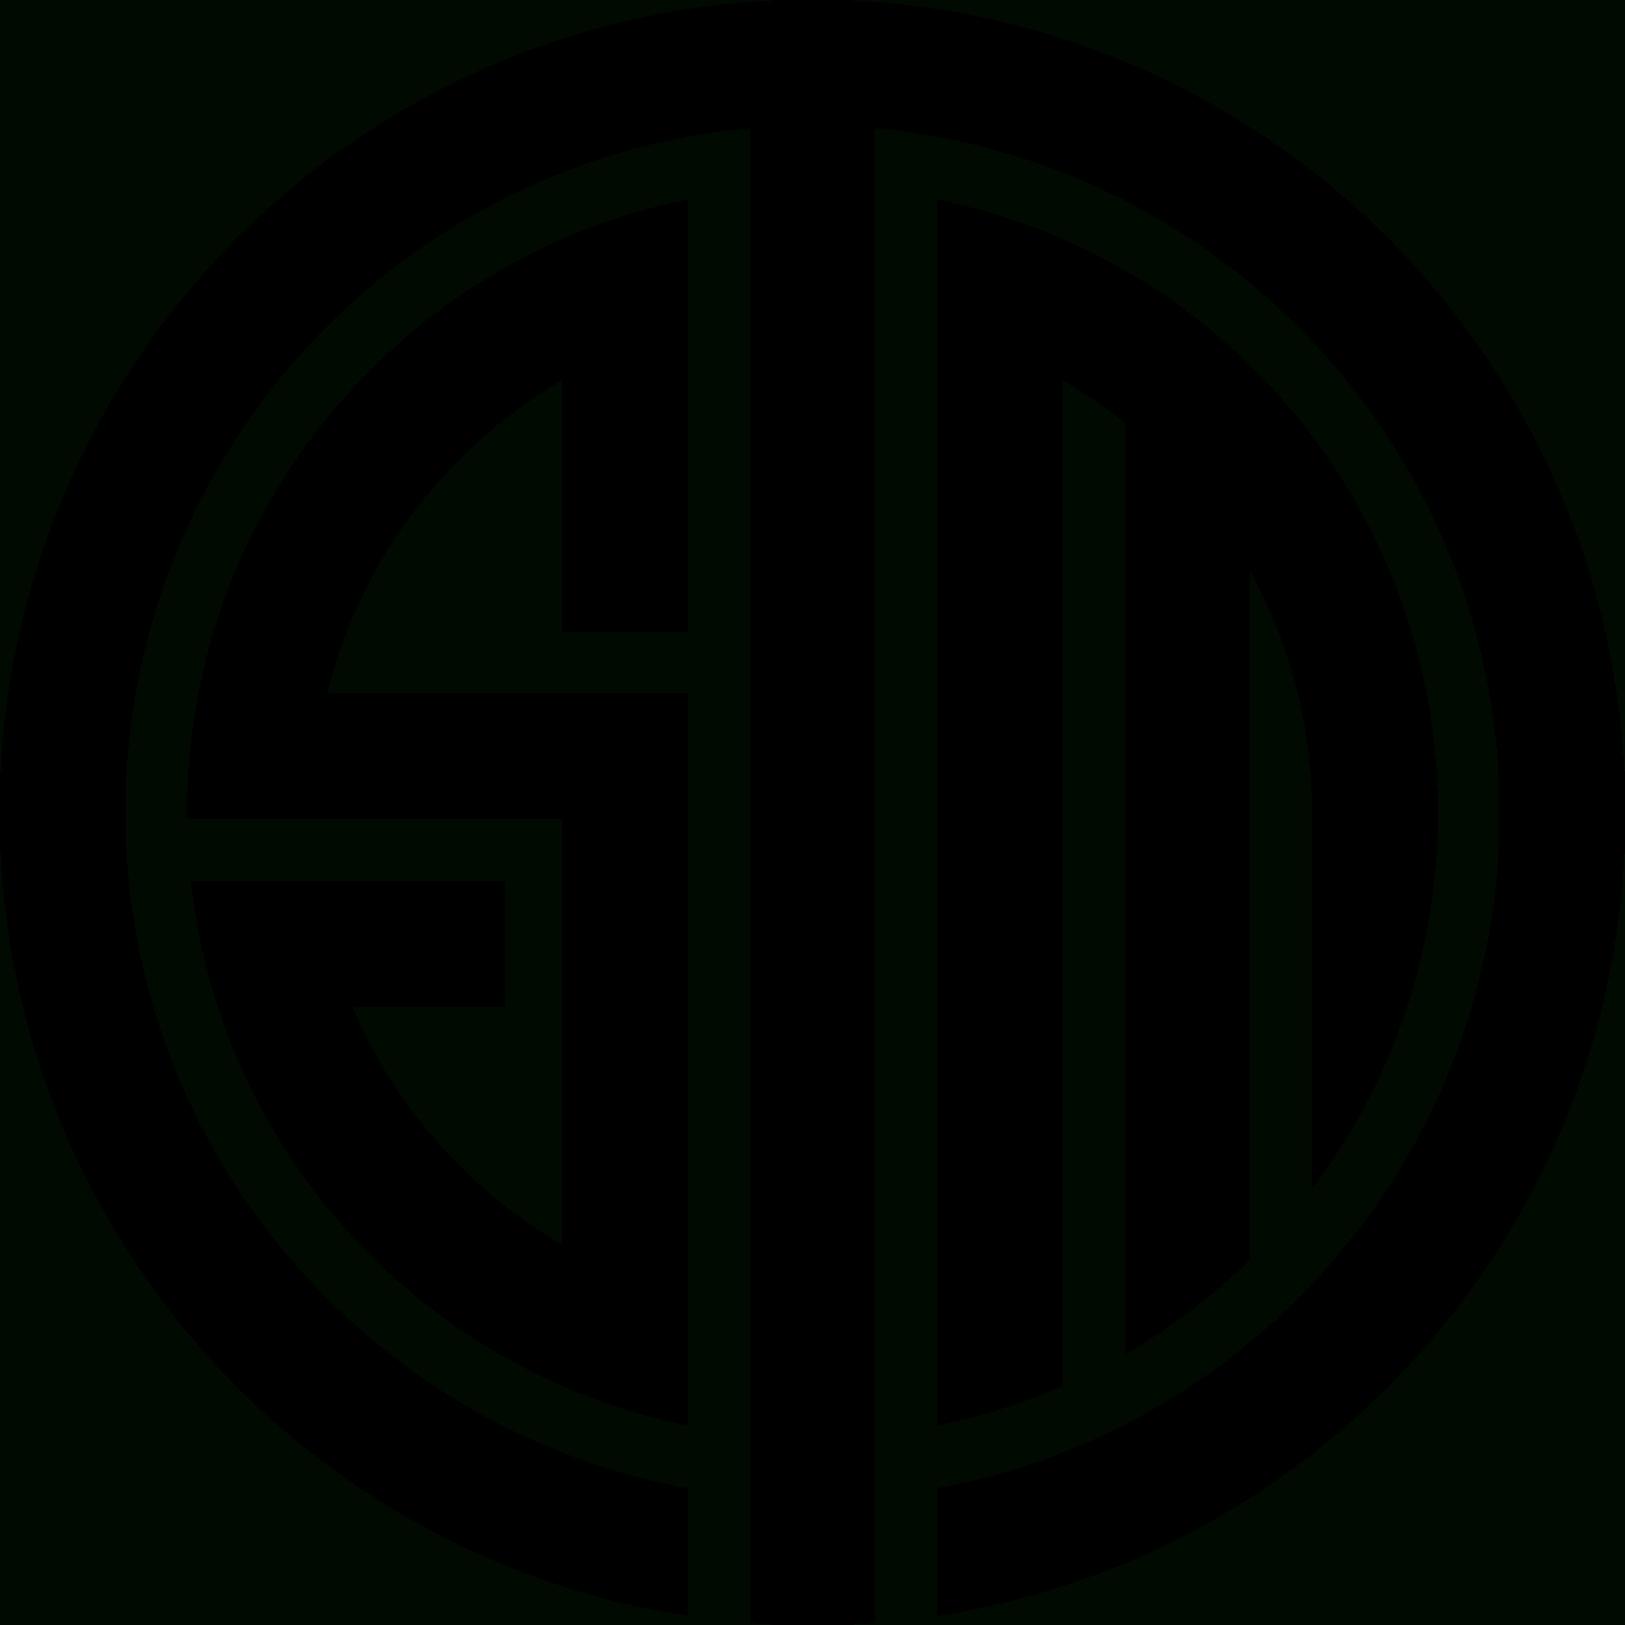 file:team solomid logo - wikimedia commons